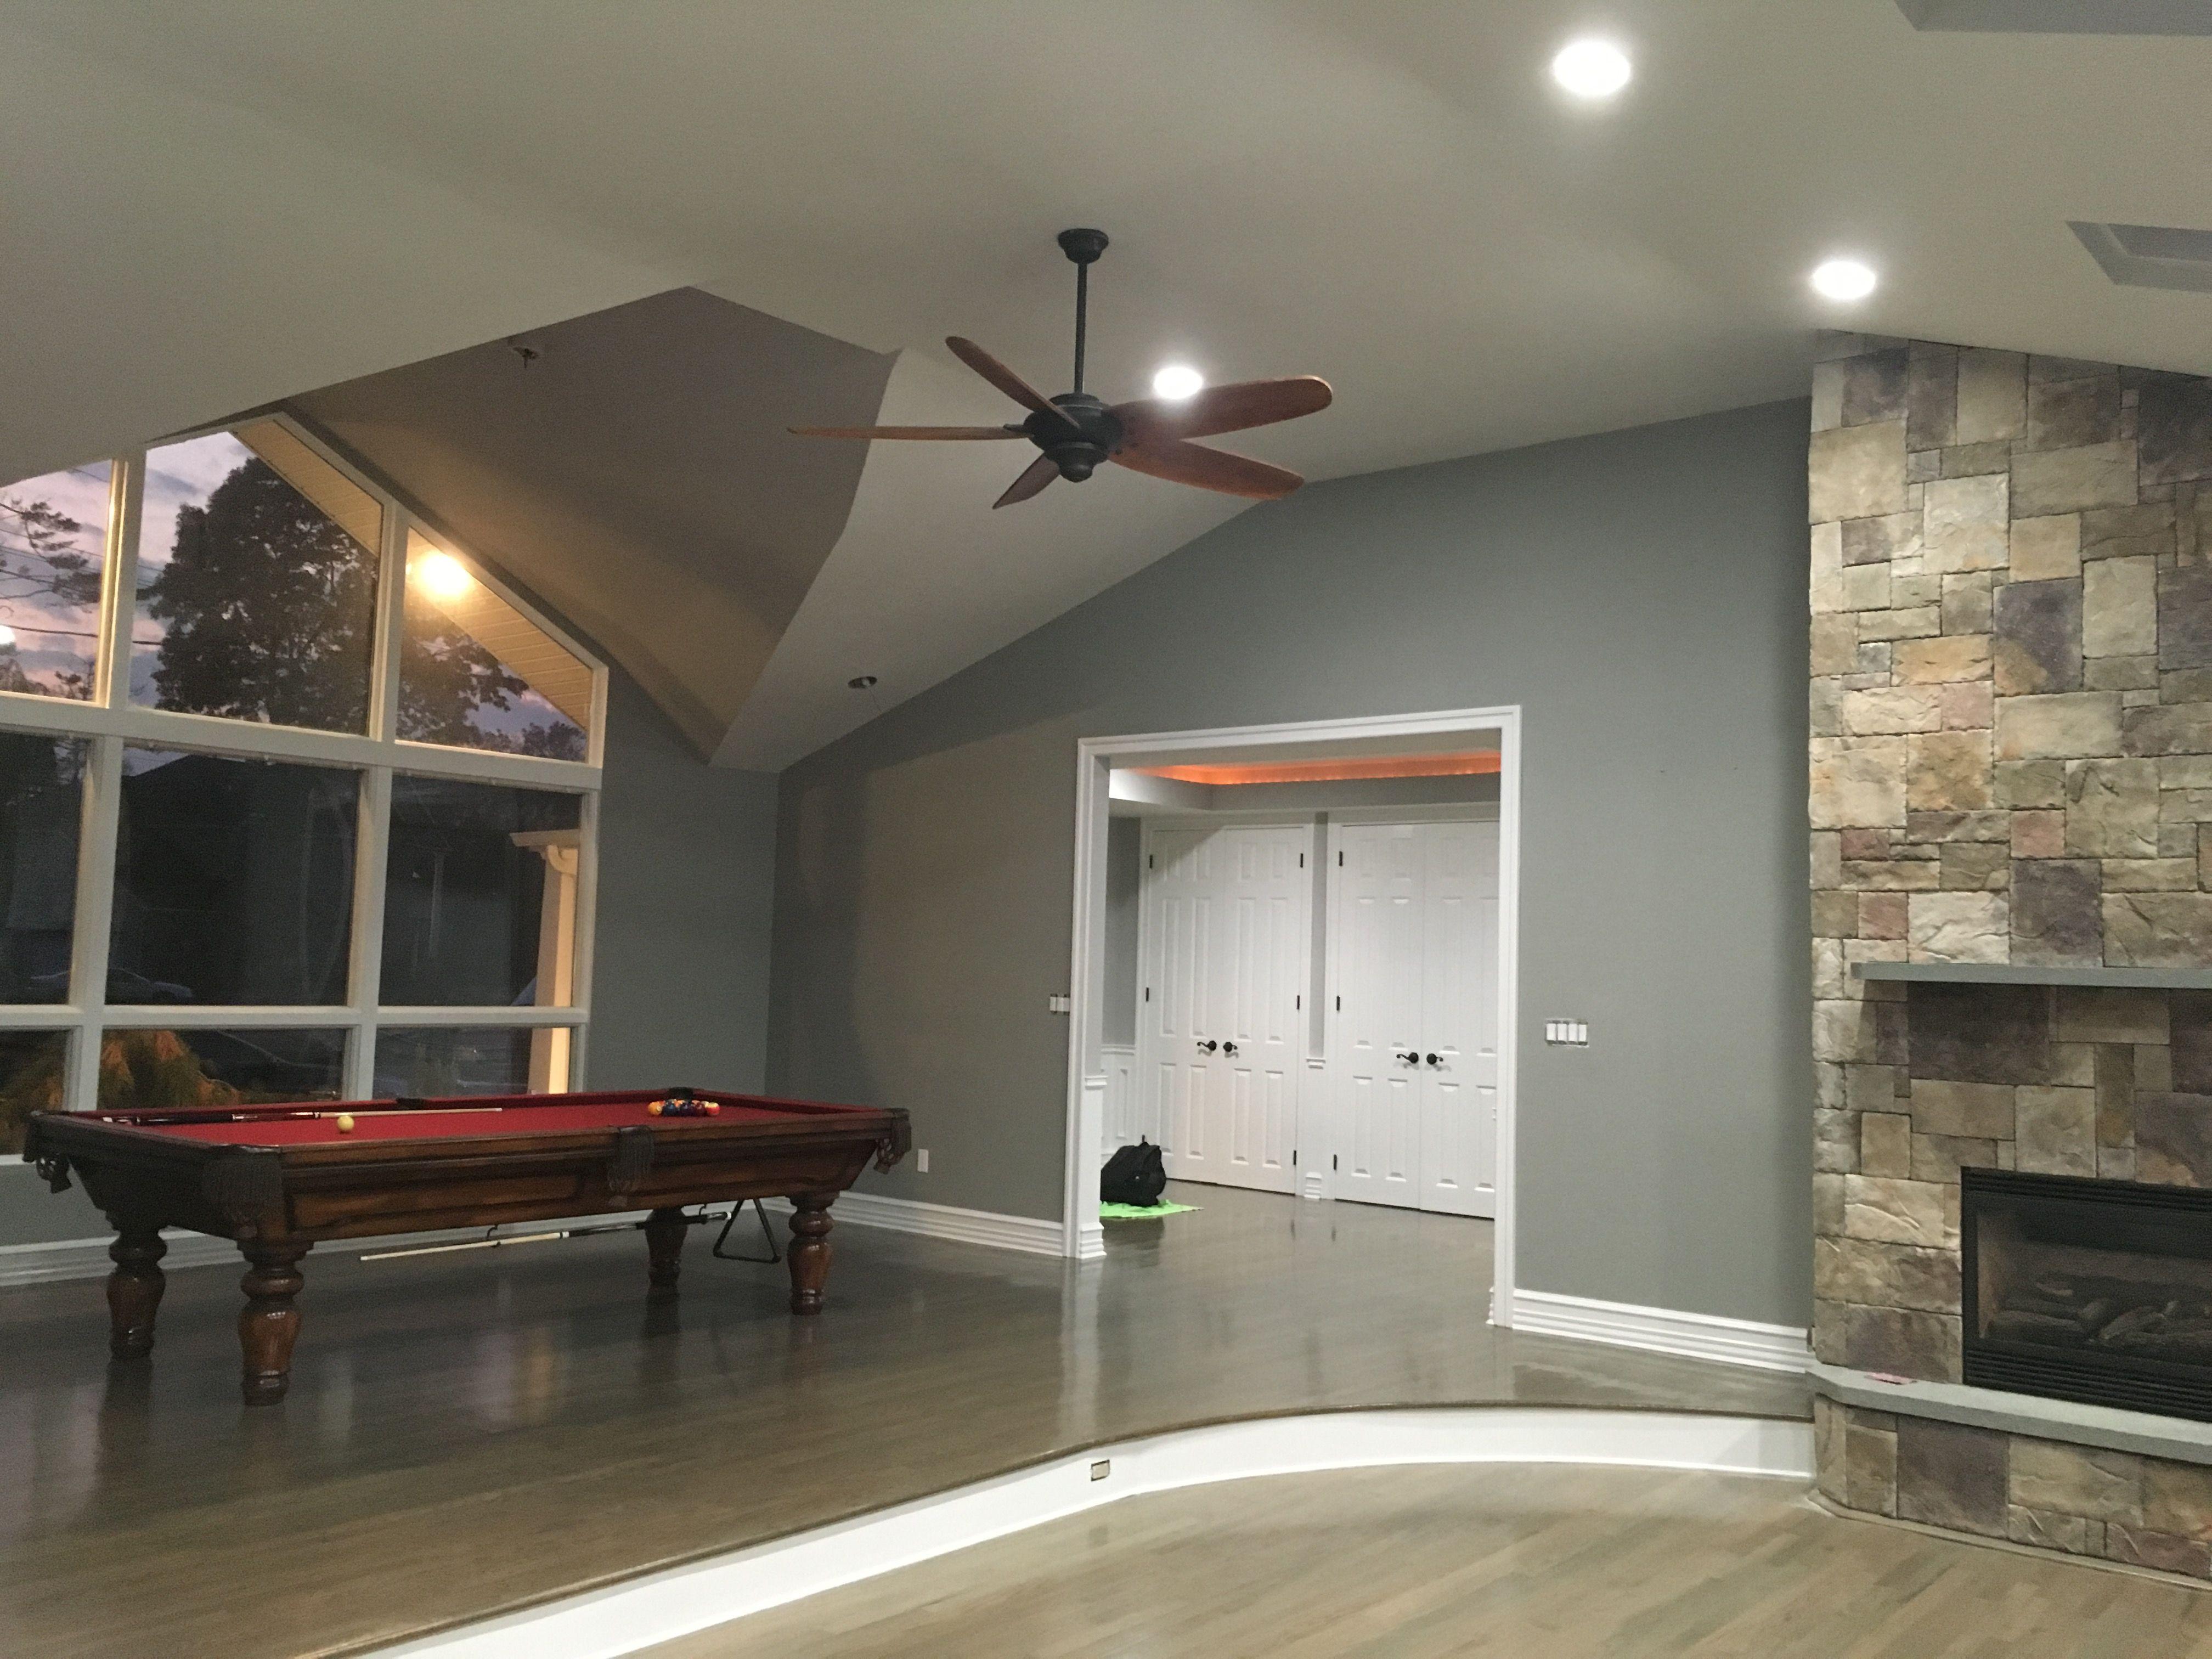 Walls Benjamin Moore Pm 7 Platinum Gray Ceiling Benjamin Moore 1548 Classic Gray Floor